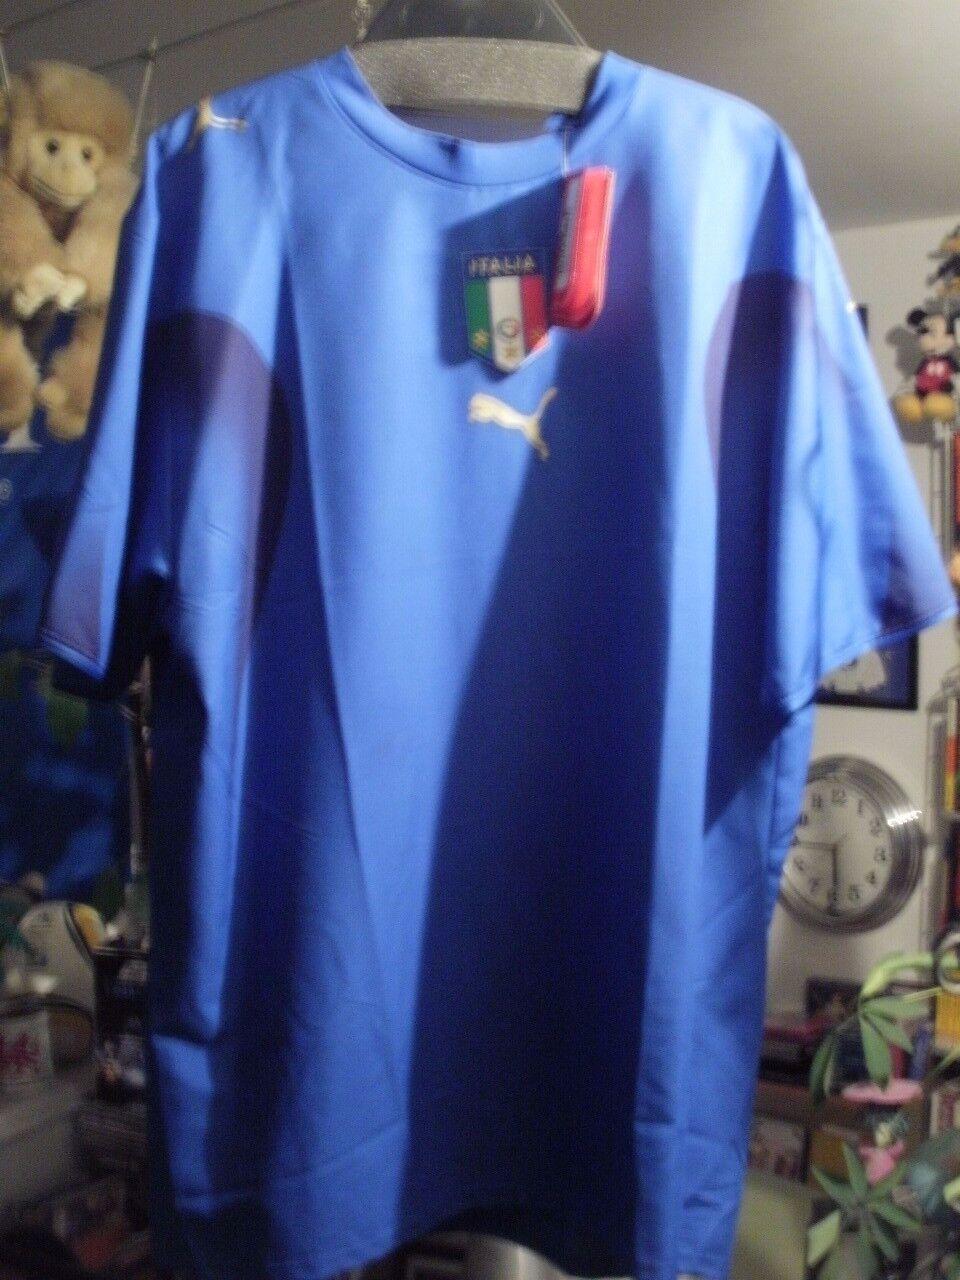 RARES Original-TRIKOT Gr. XL  ITALIEN   ITALIA ITALIA ITALIA  NEU mit Etikett Fussball Fußball d4b6ee